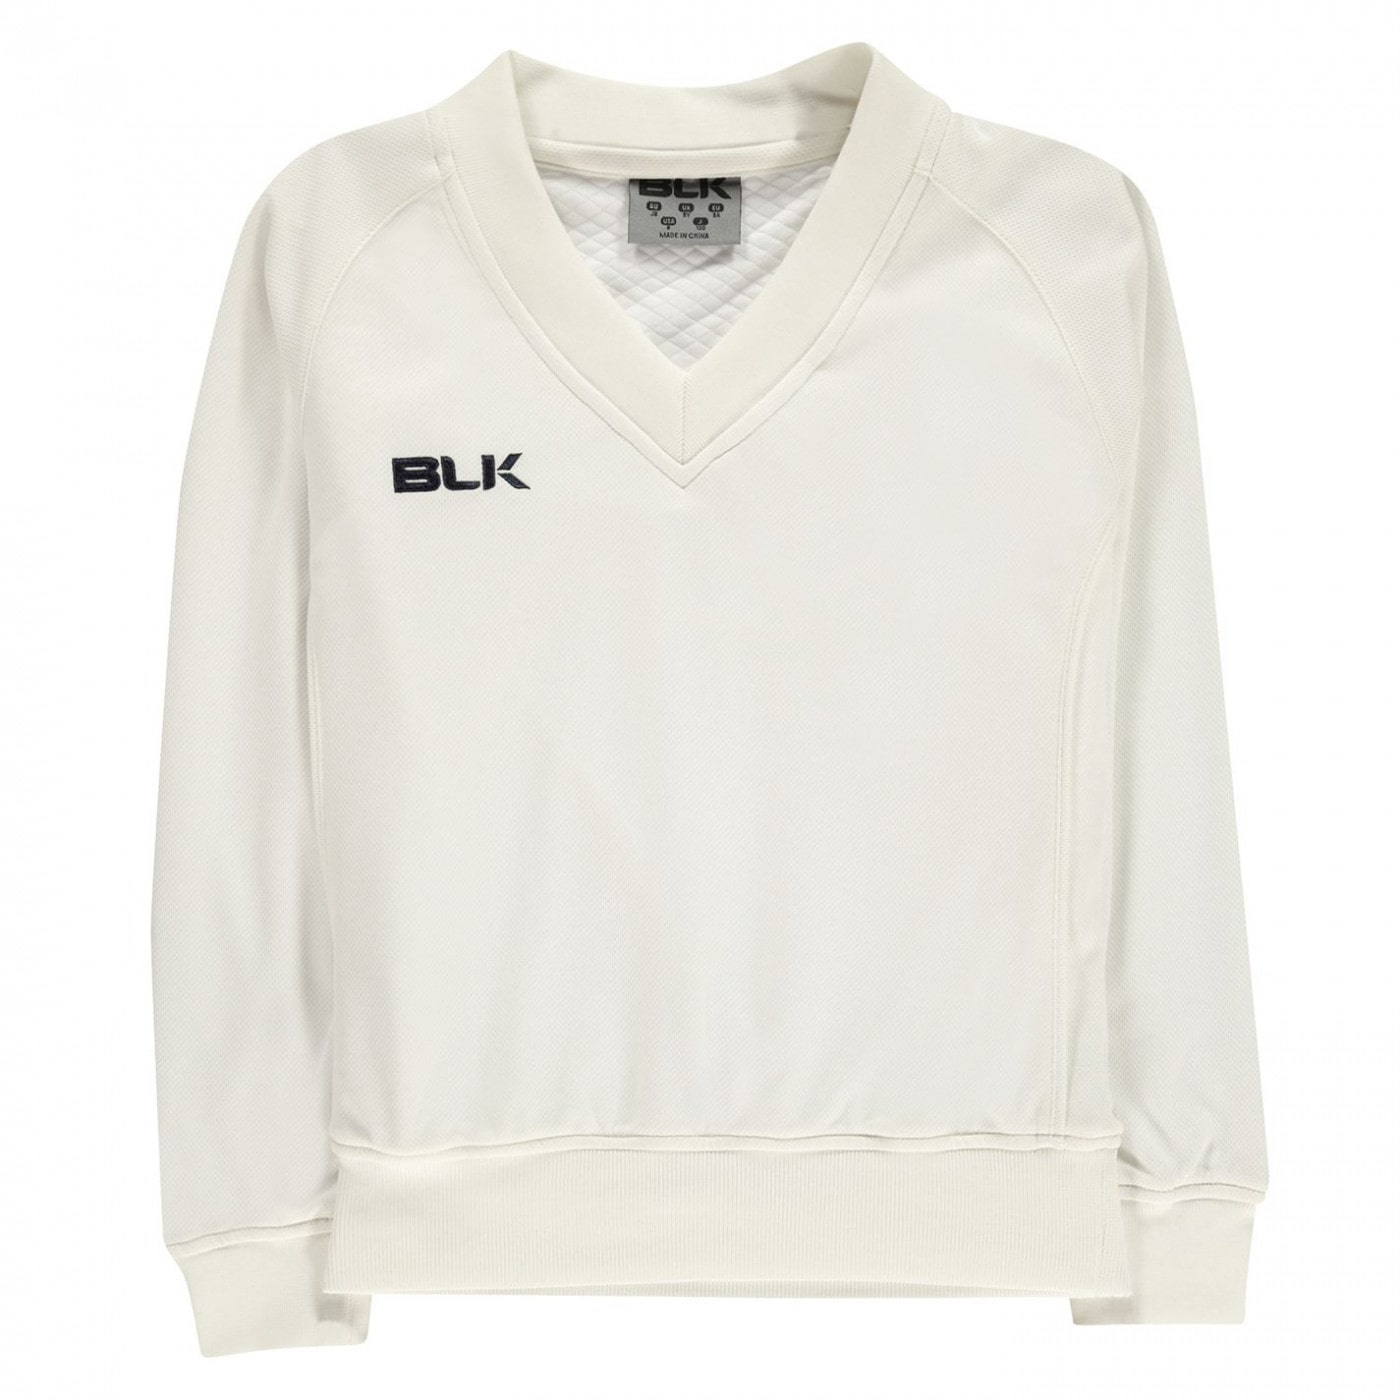 BLK Boys Long Sleeve Sweater